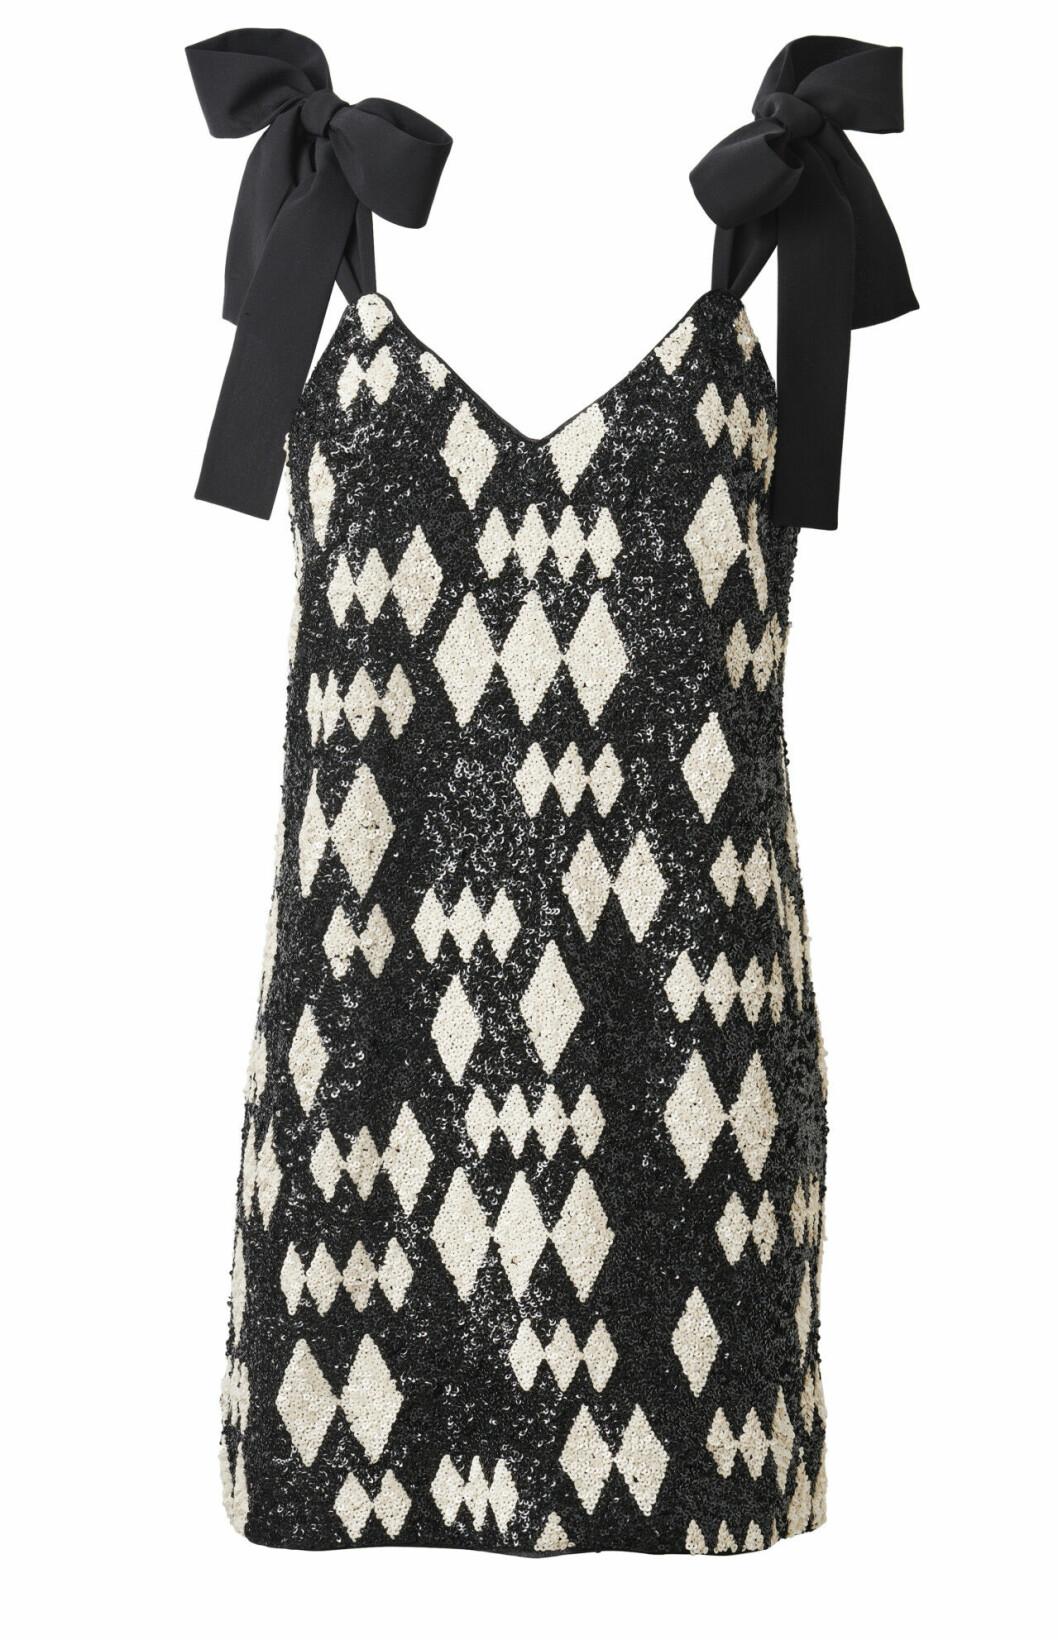 H&M Conscious Exclusive AW19 –svartvit klänning